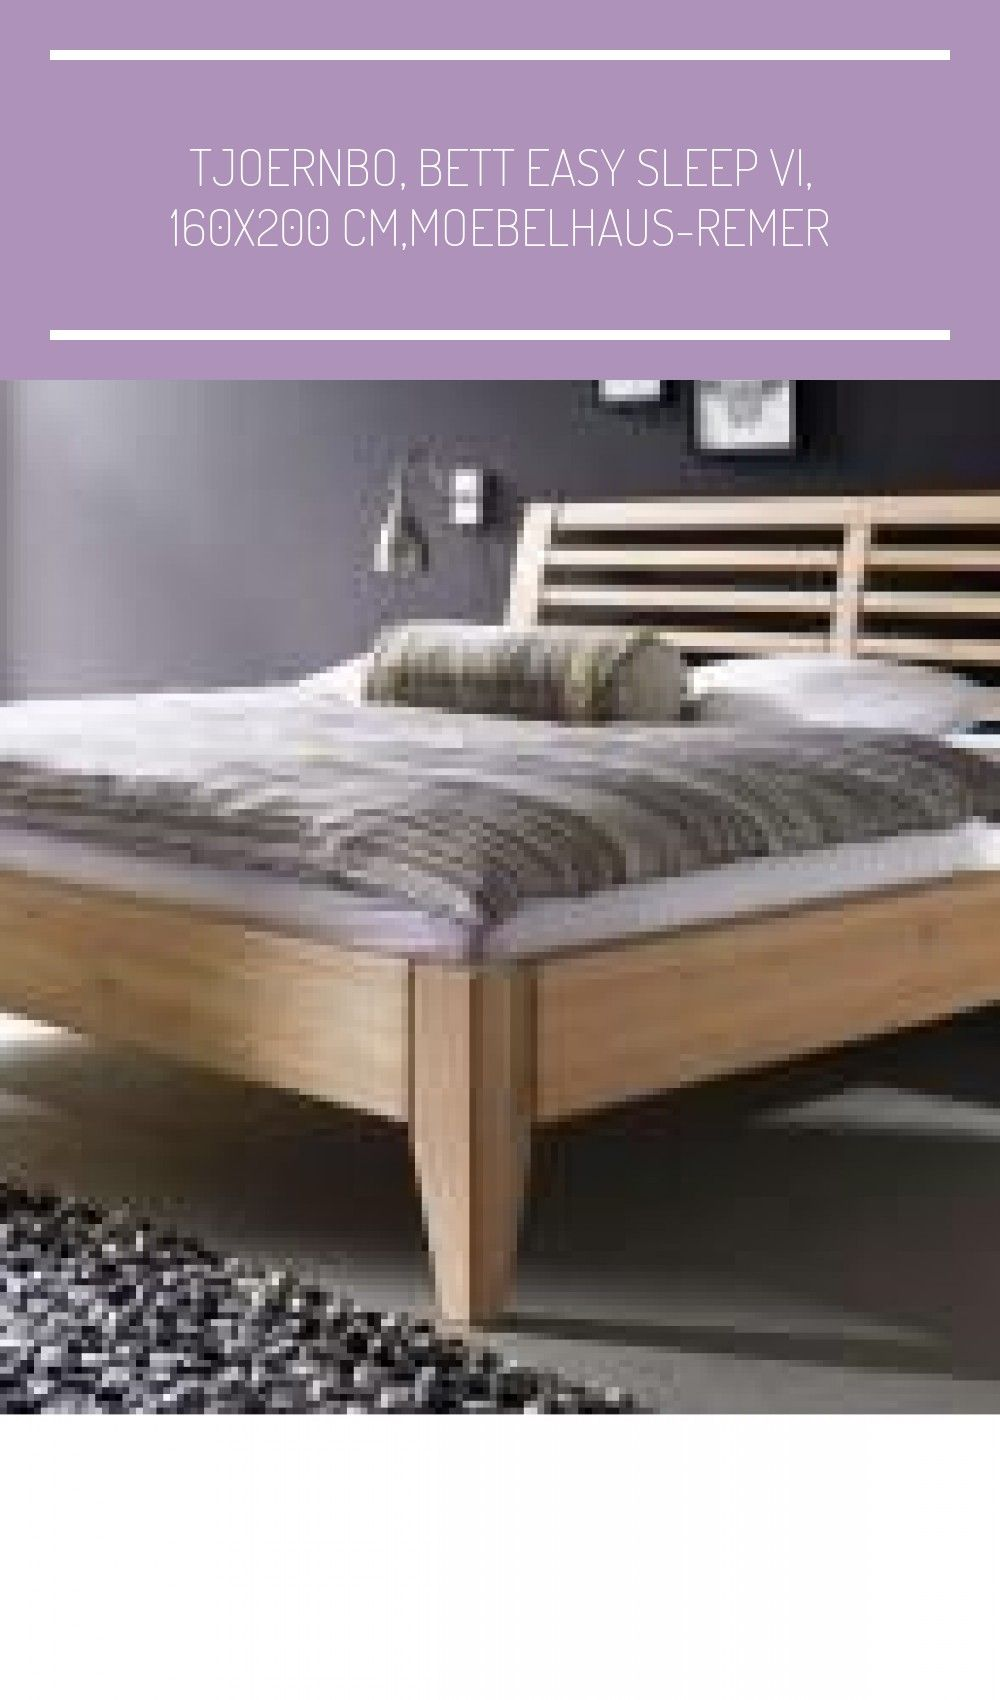 Tjoernbo Bett Easy Sleep Vi 160x200 Cm Moebelhaus Remer Haus Deko Ideen In 2020 Home Decor Home Furniture